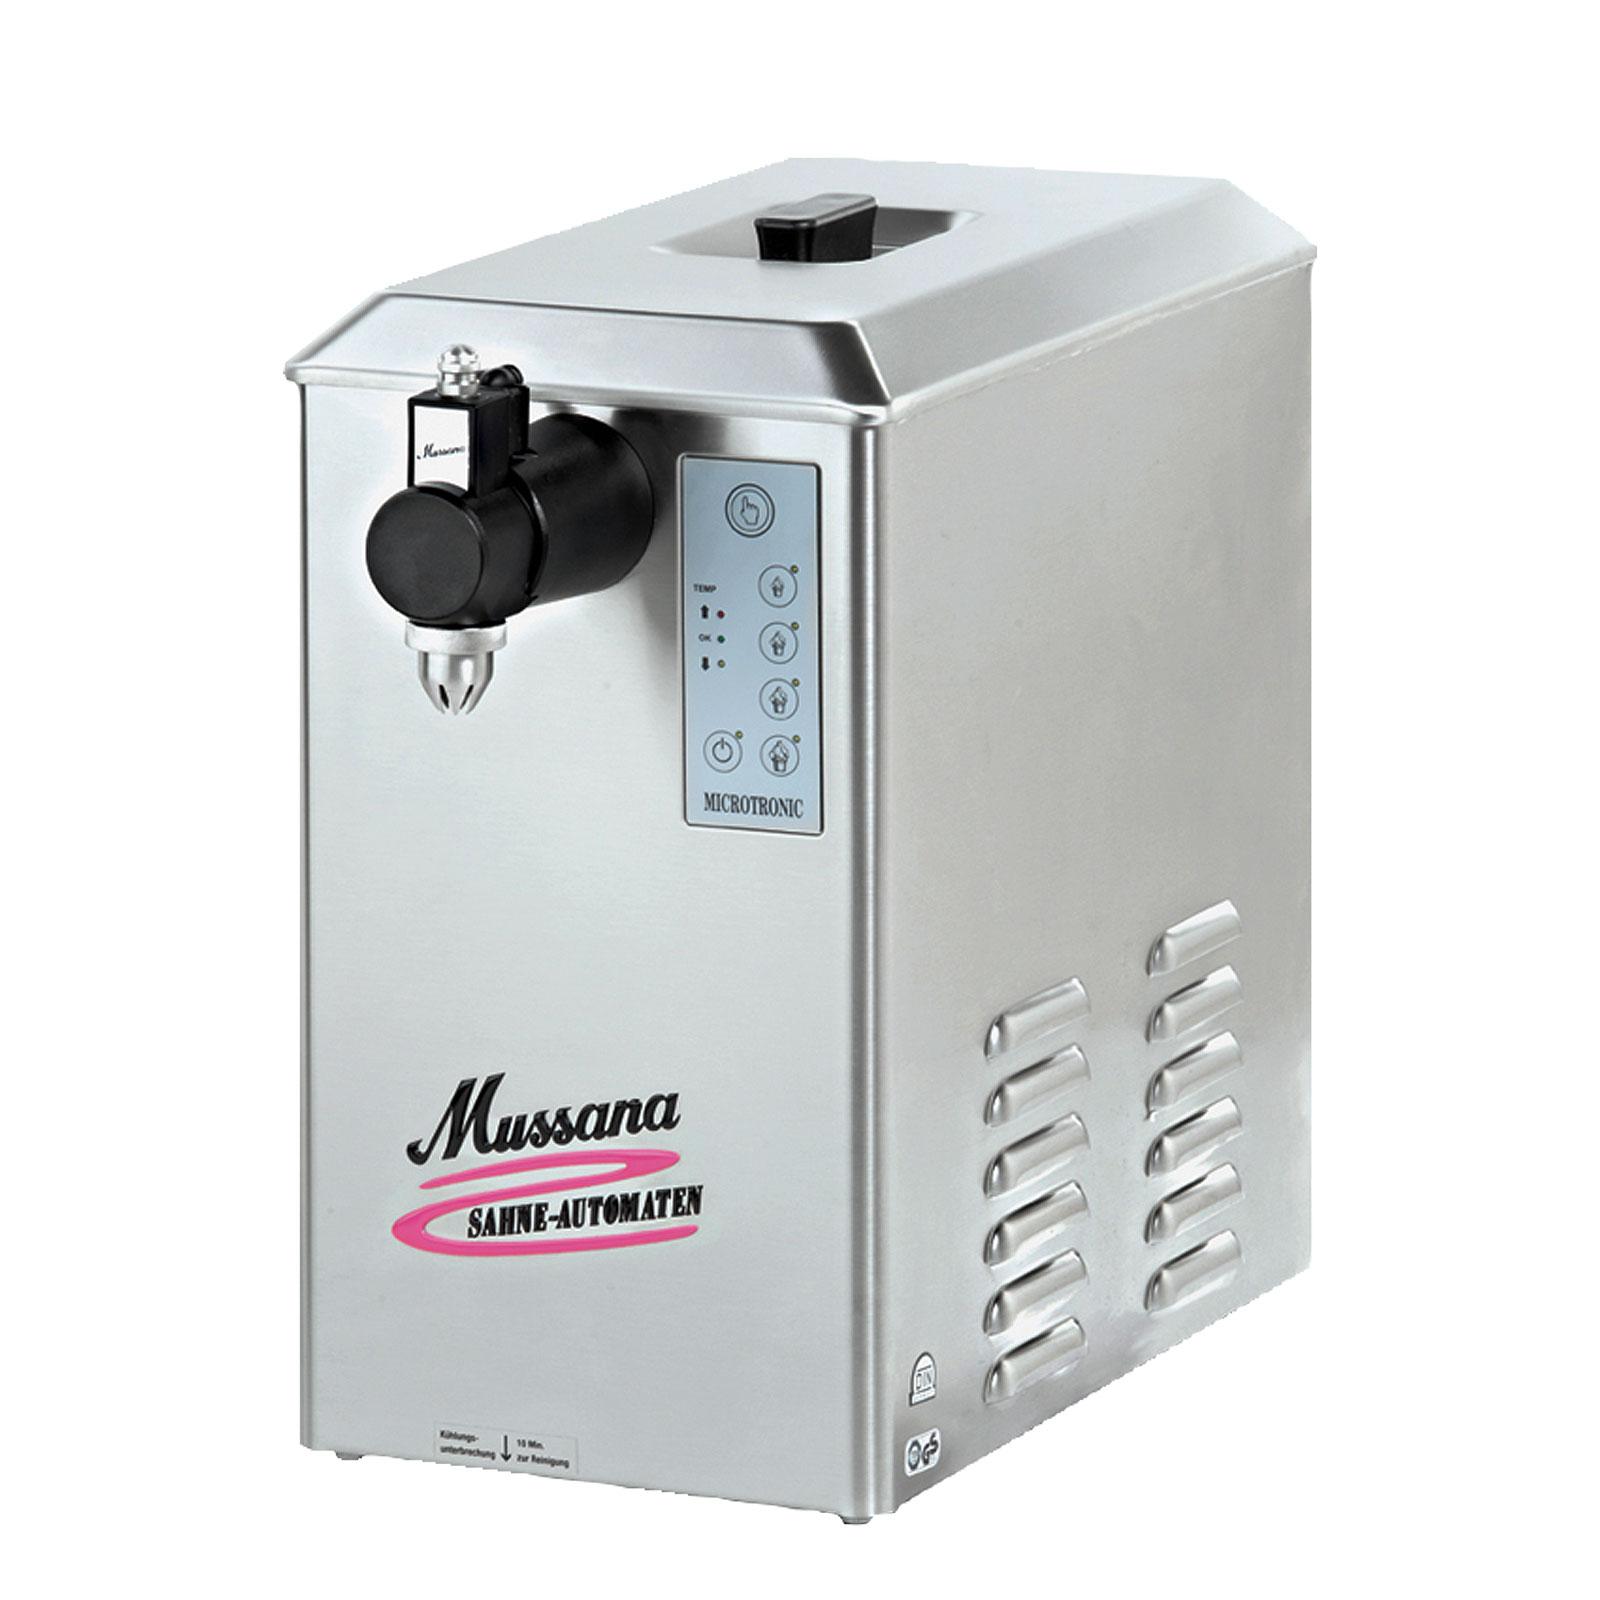 Mussana 6-Liter Lady Sahnemaschine inkl 8l Reiniger